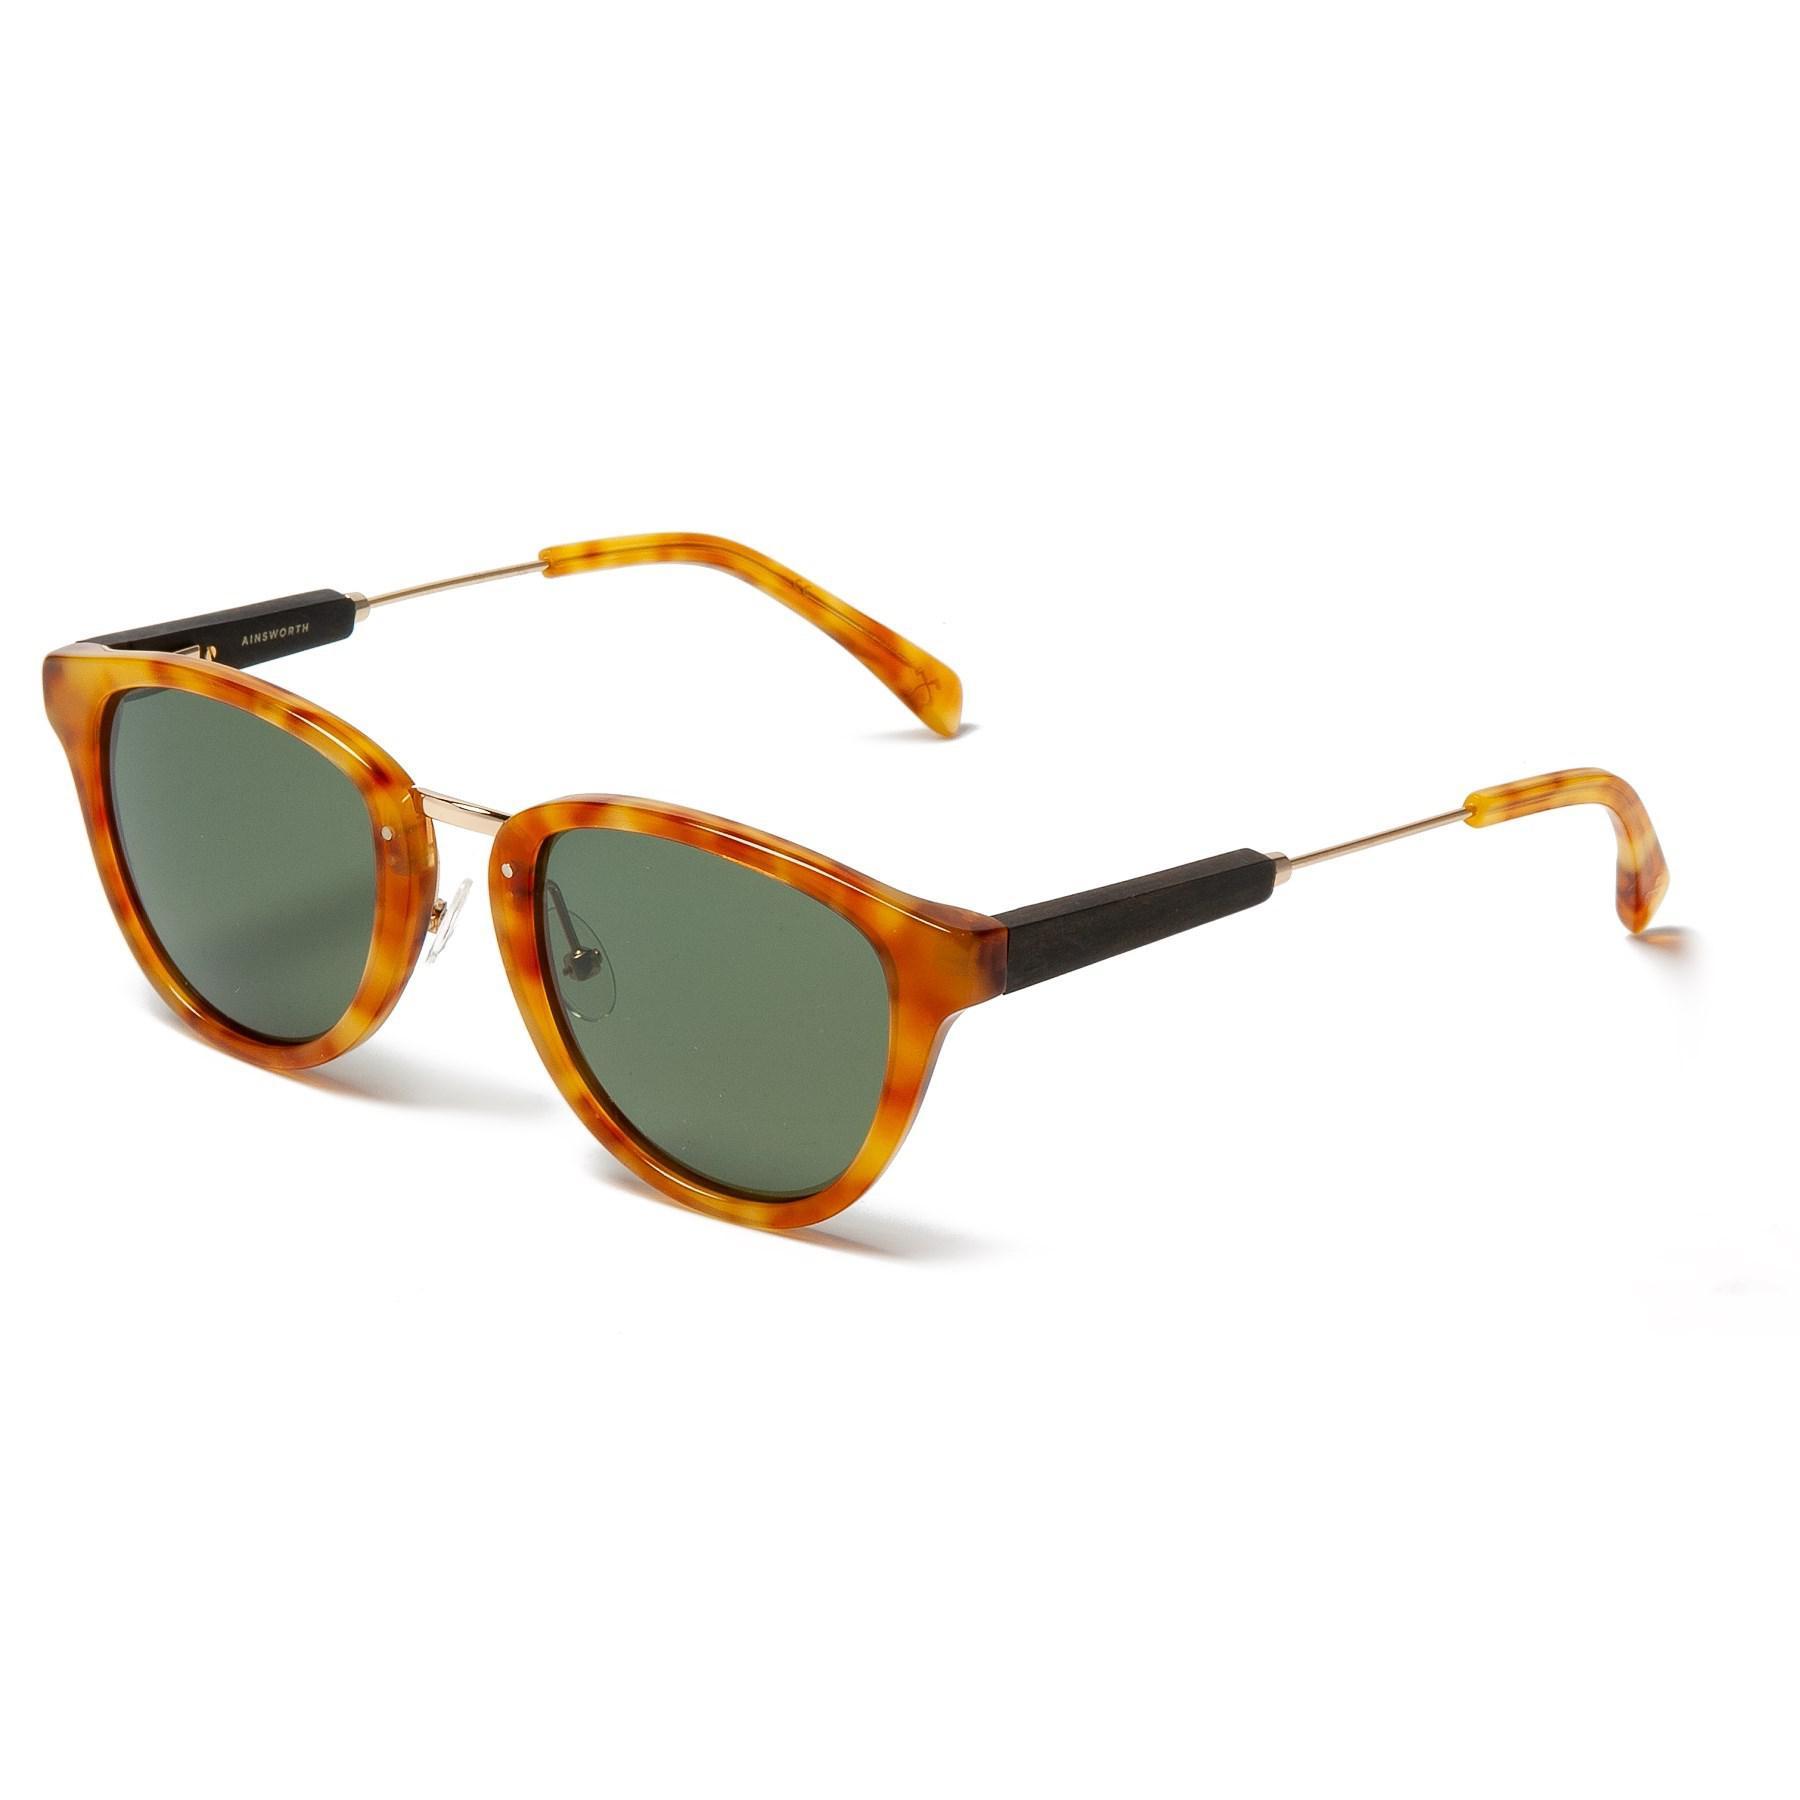 0dc052ec23a Lyst - Shwood Ainsworth Sunglasses in Metallic for Men